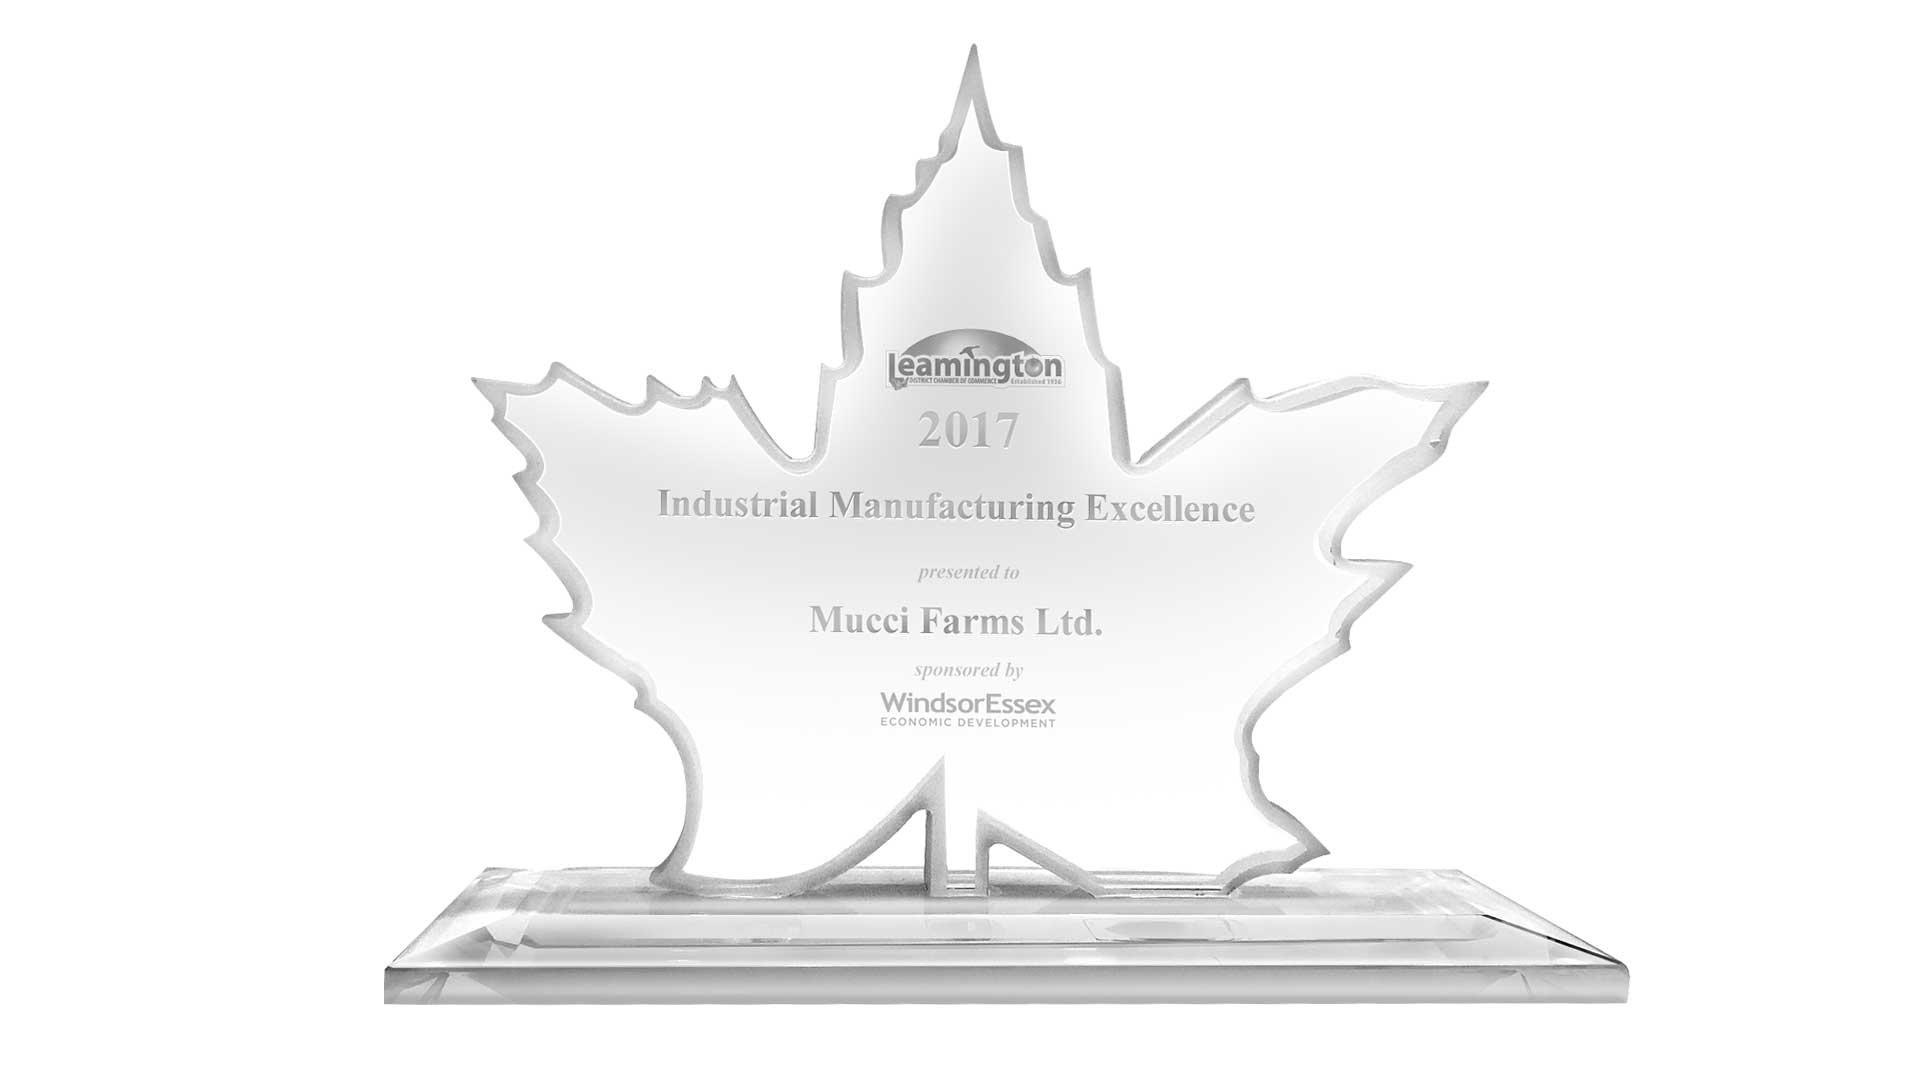 leamington business excellence award header image